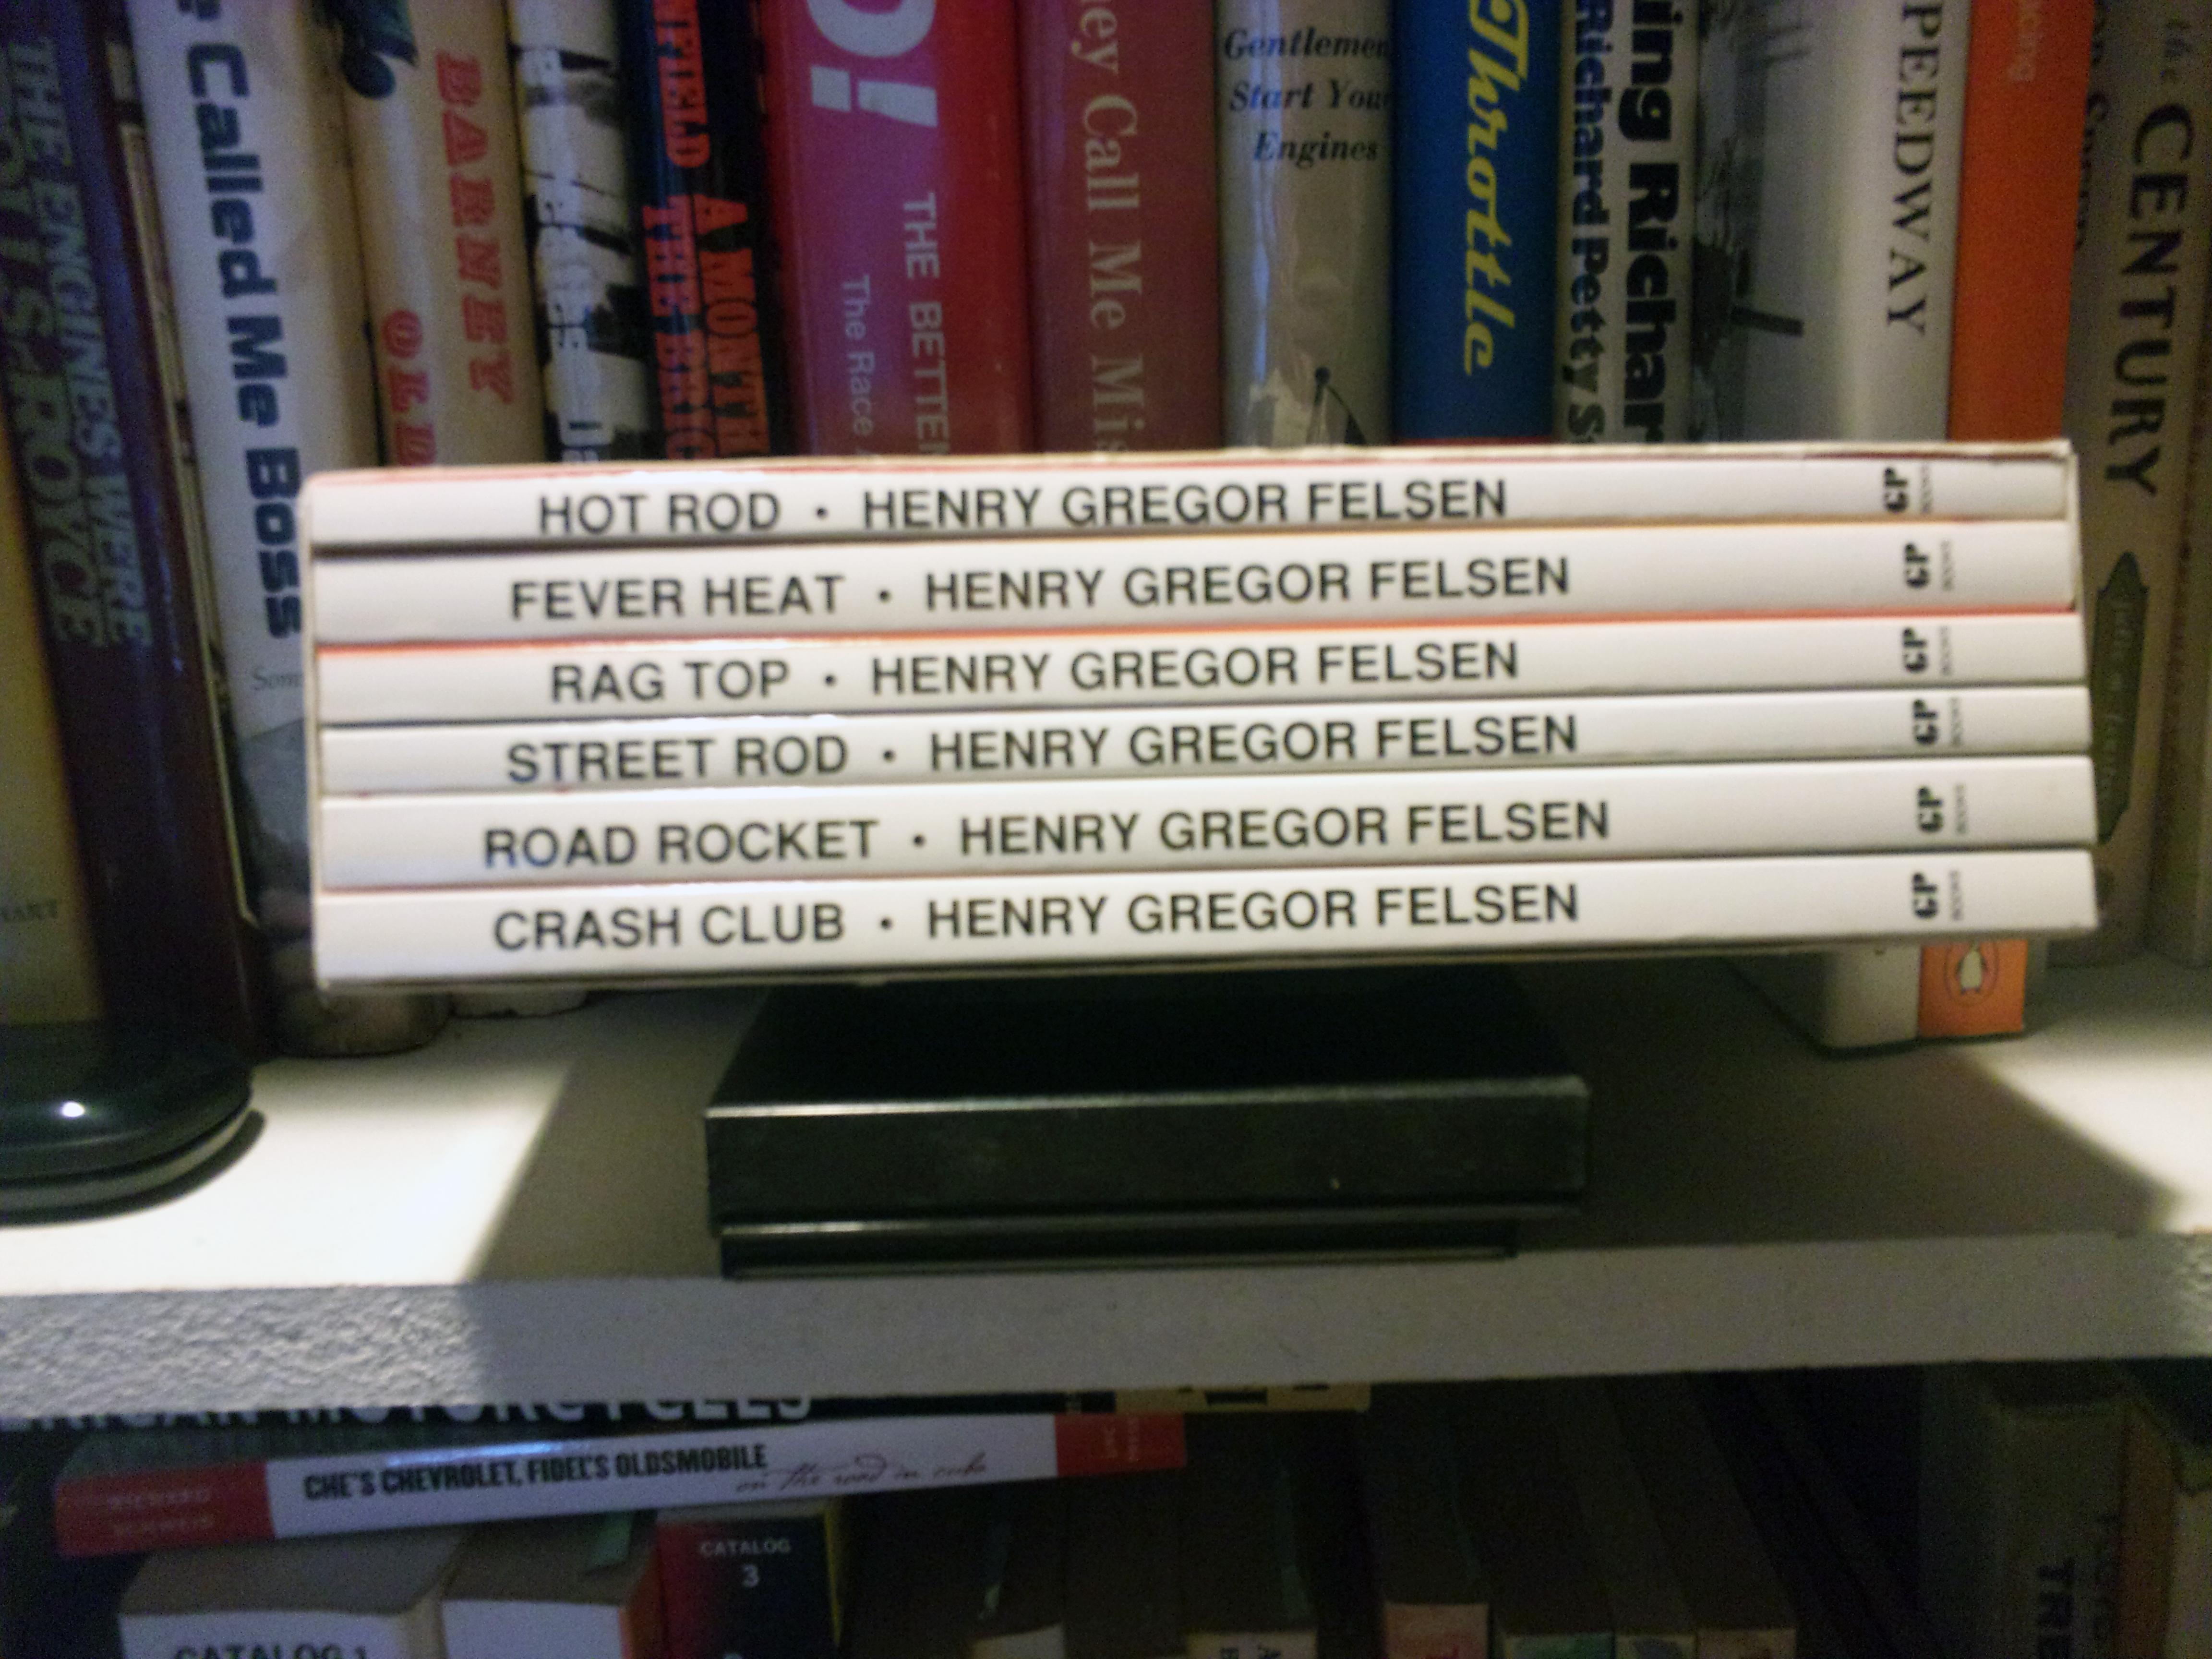 HGF Titles